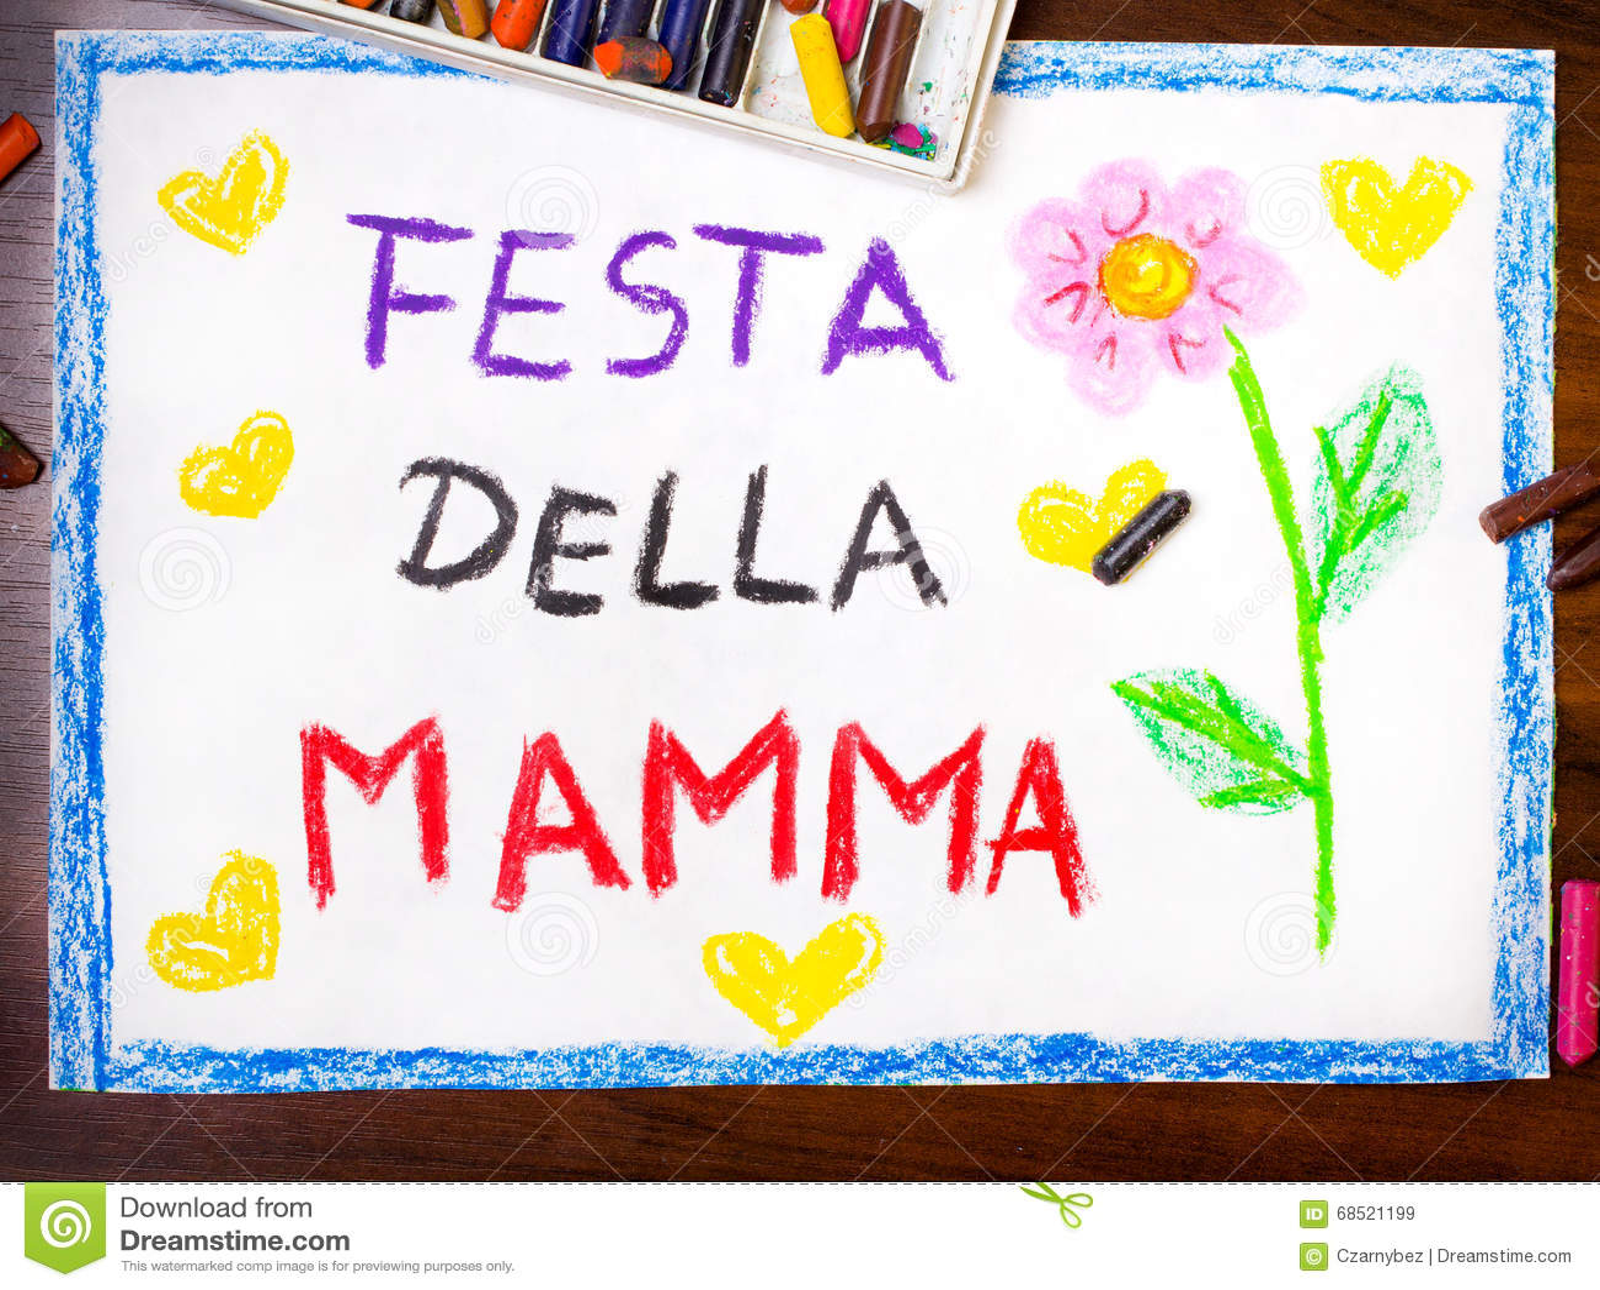 Italian mothers day card stock illustration illustration of italian mother s day card kristyandbryce Choice Image